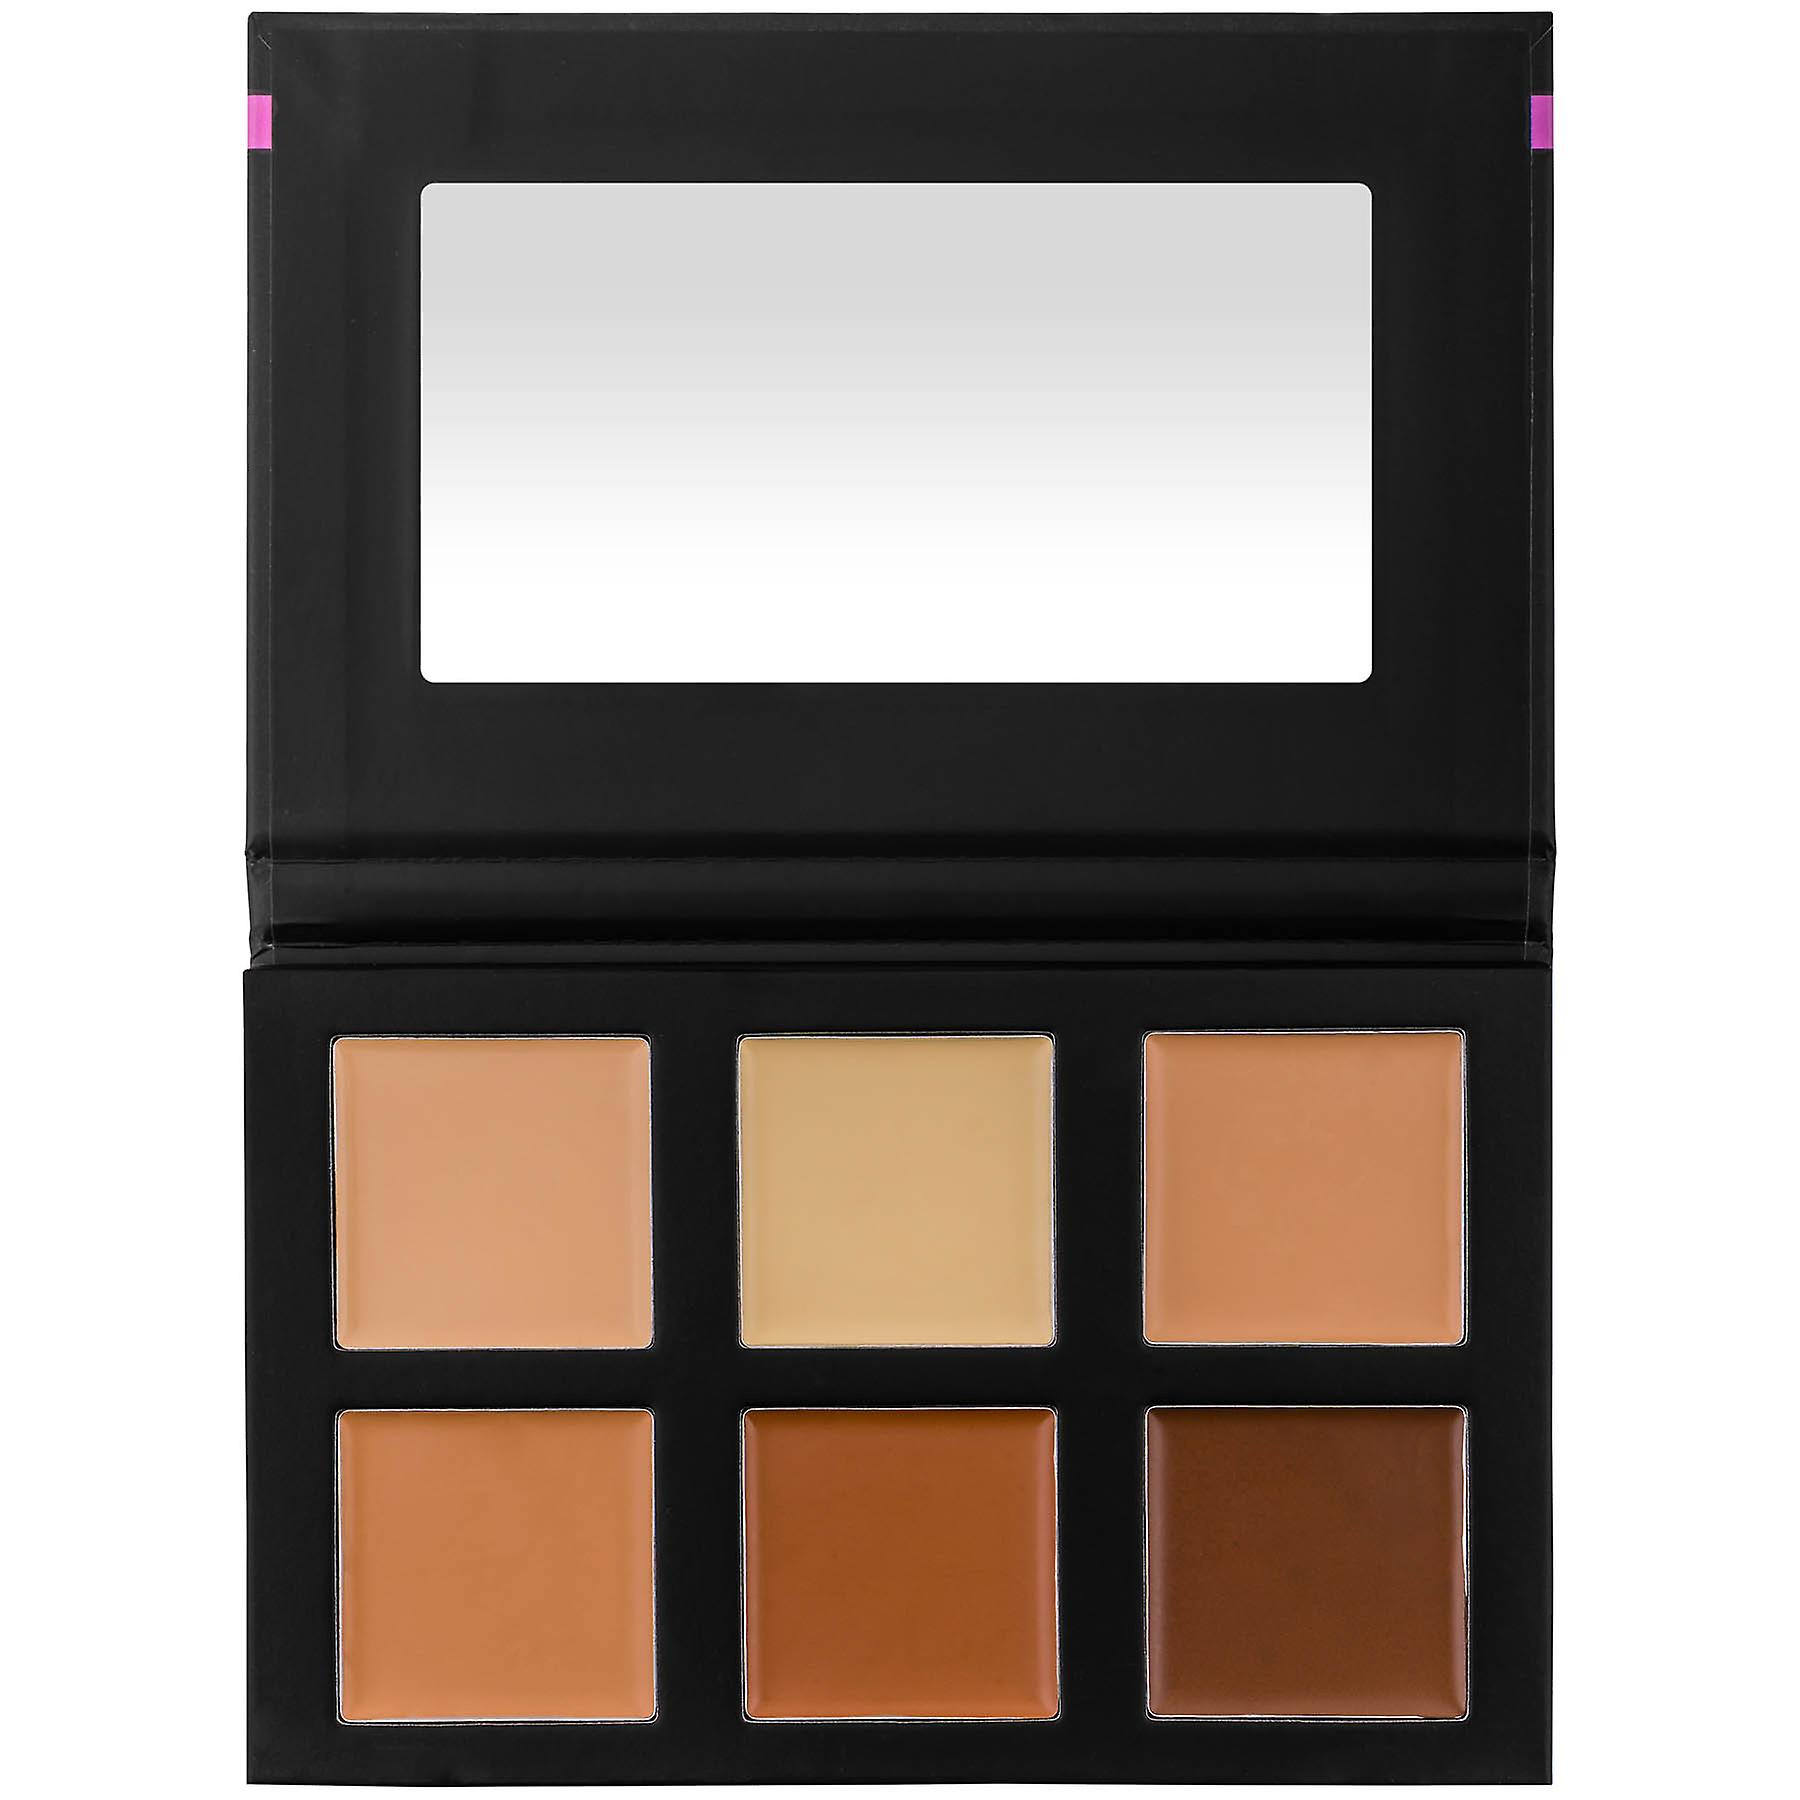 SHANY 4-Layer Contour/Highlight Makeup Set - Recharges